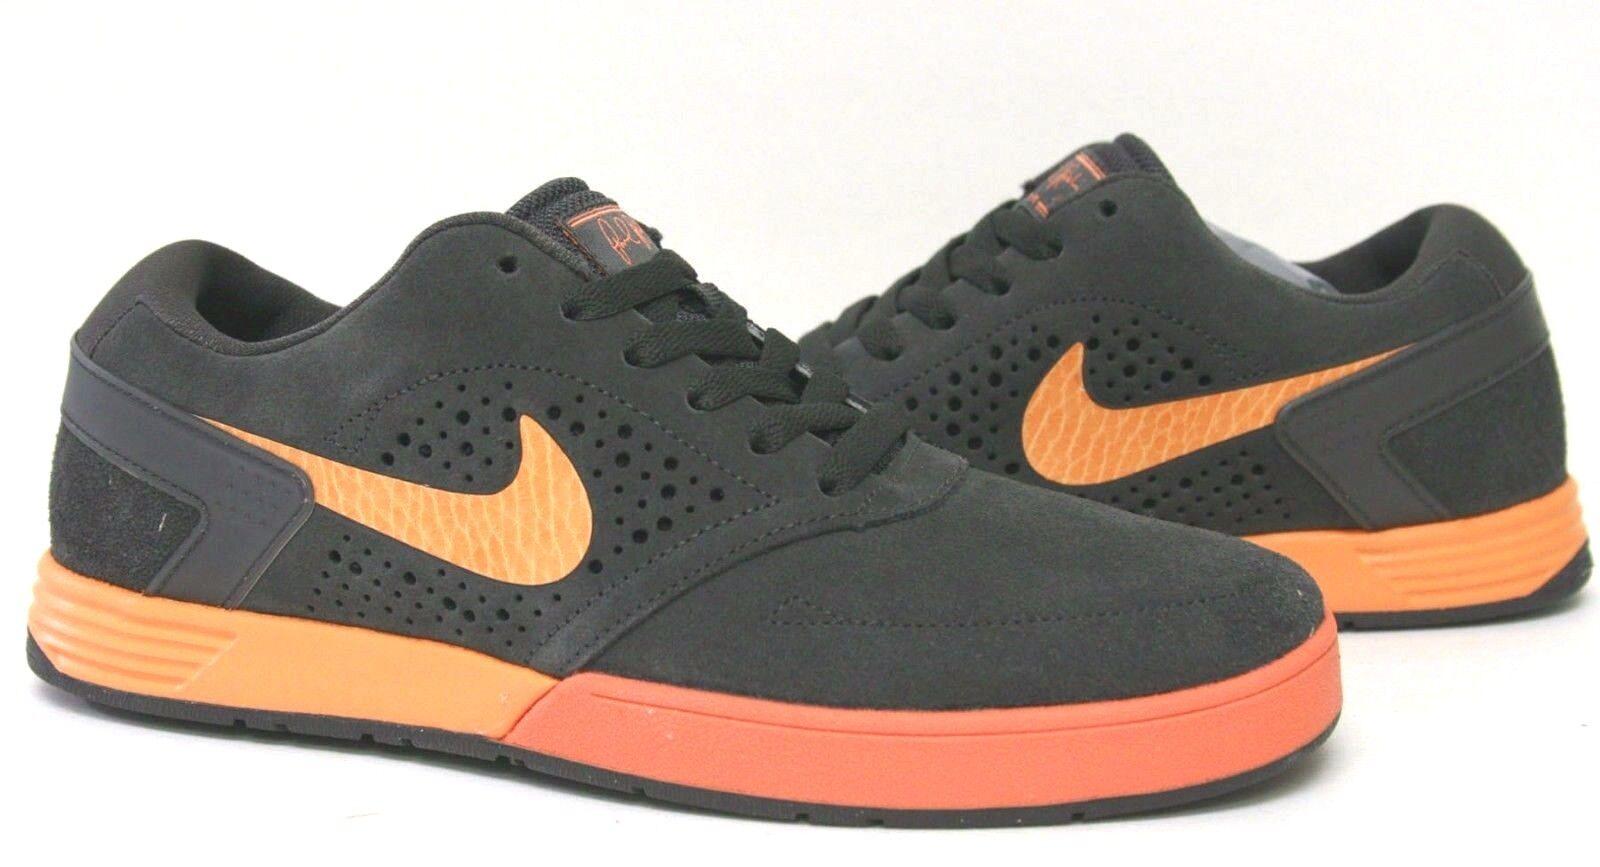 Nike Men's Shoes SB Paul Rodriguez 6 Skateboarding Shoes 525133-080 Men's Size 8